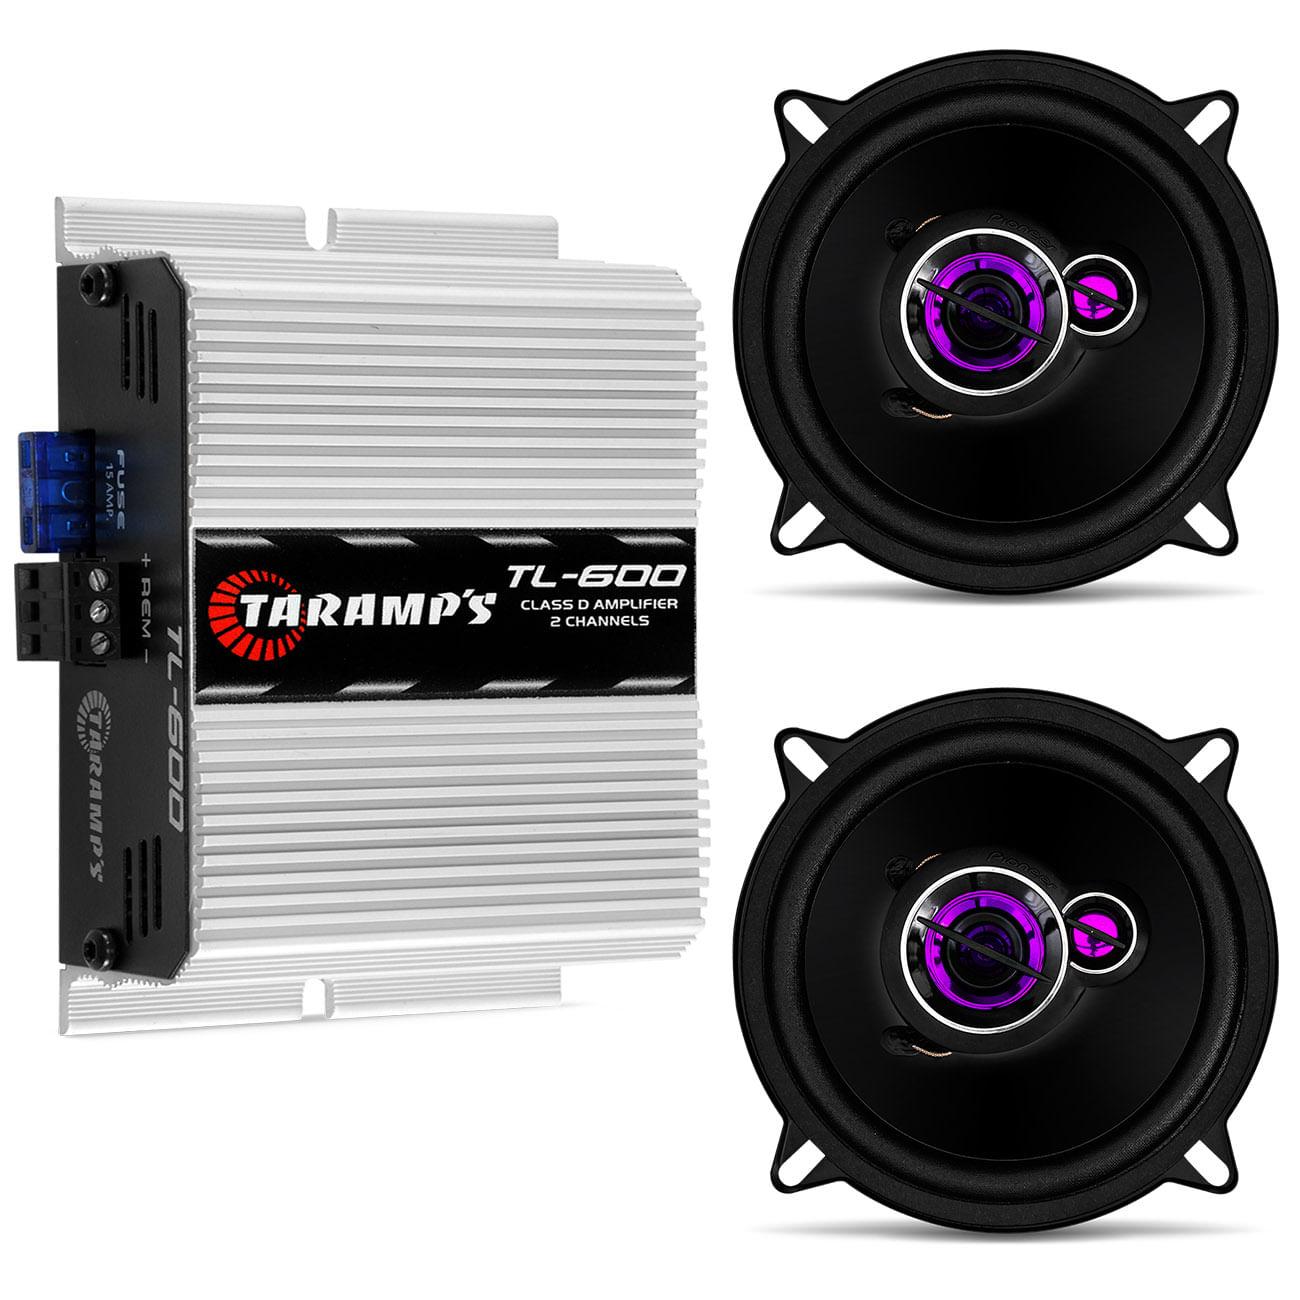 Kit Módulo Amplificador Taramps 170W + Par Alto Falante Pioneer 1 / 4 Polegadas 100W